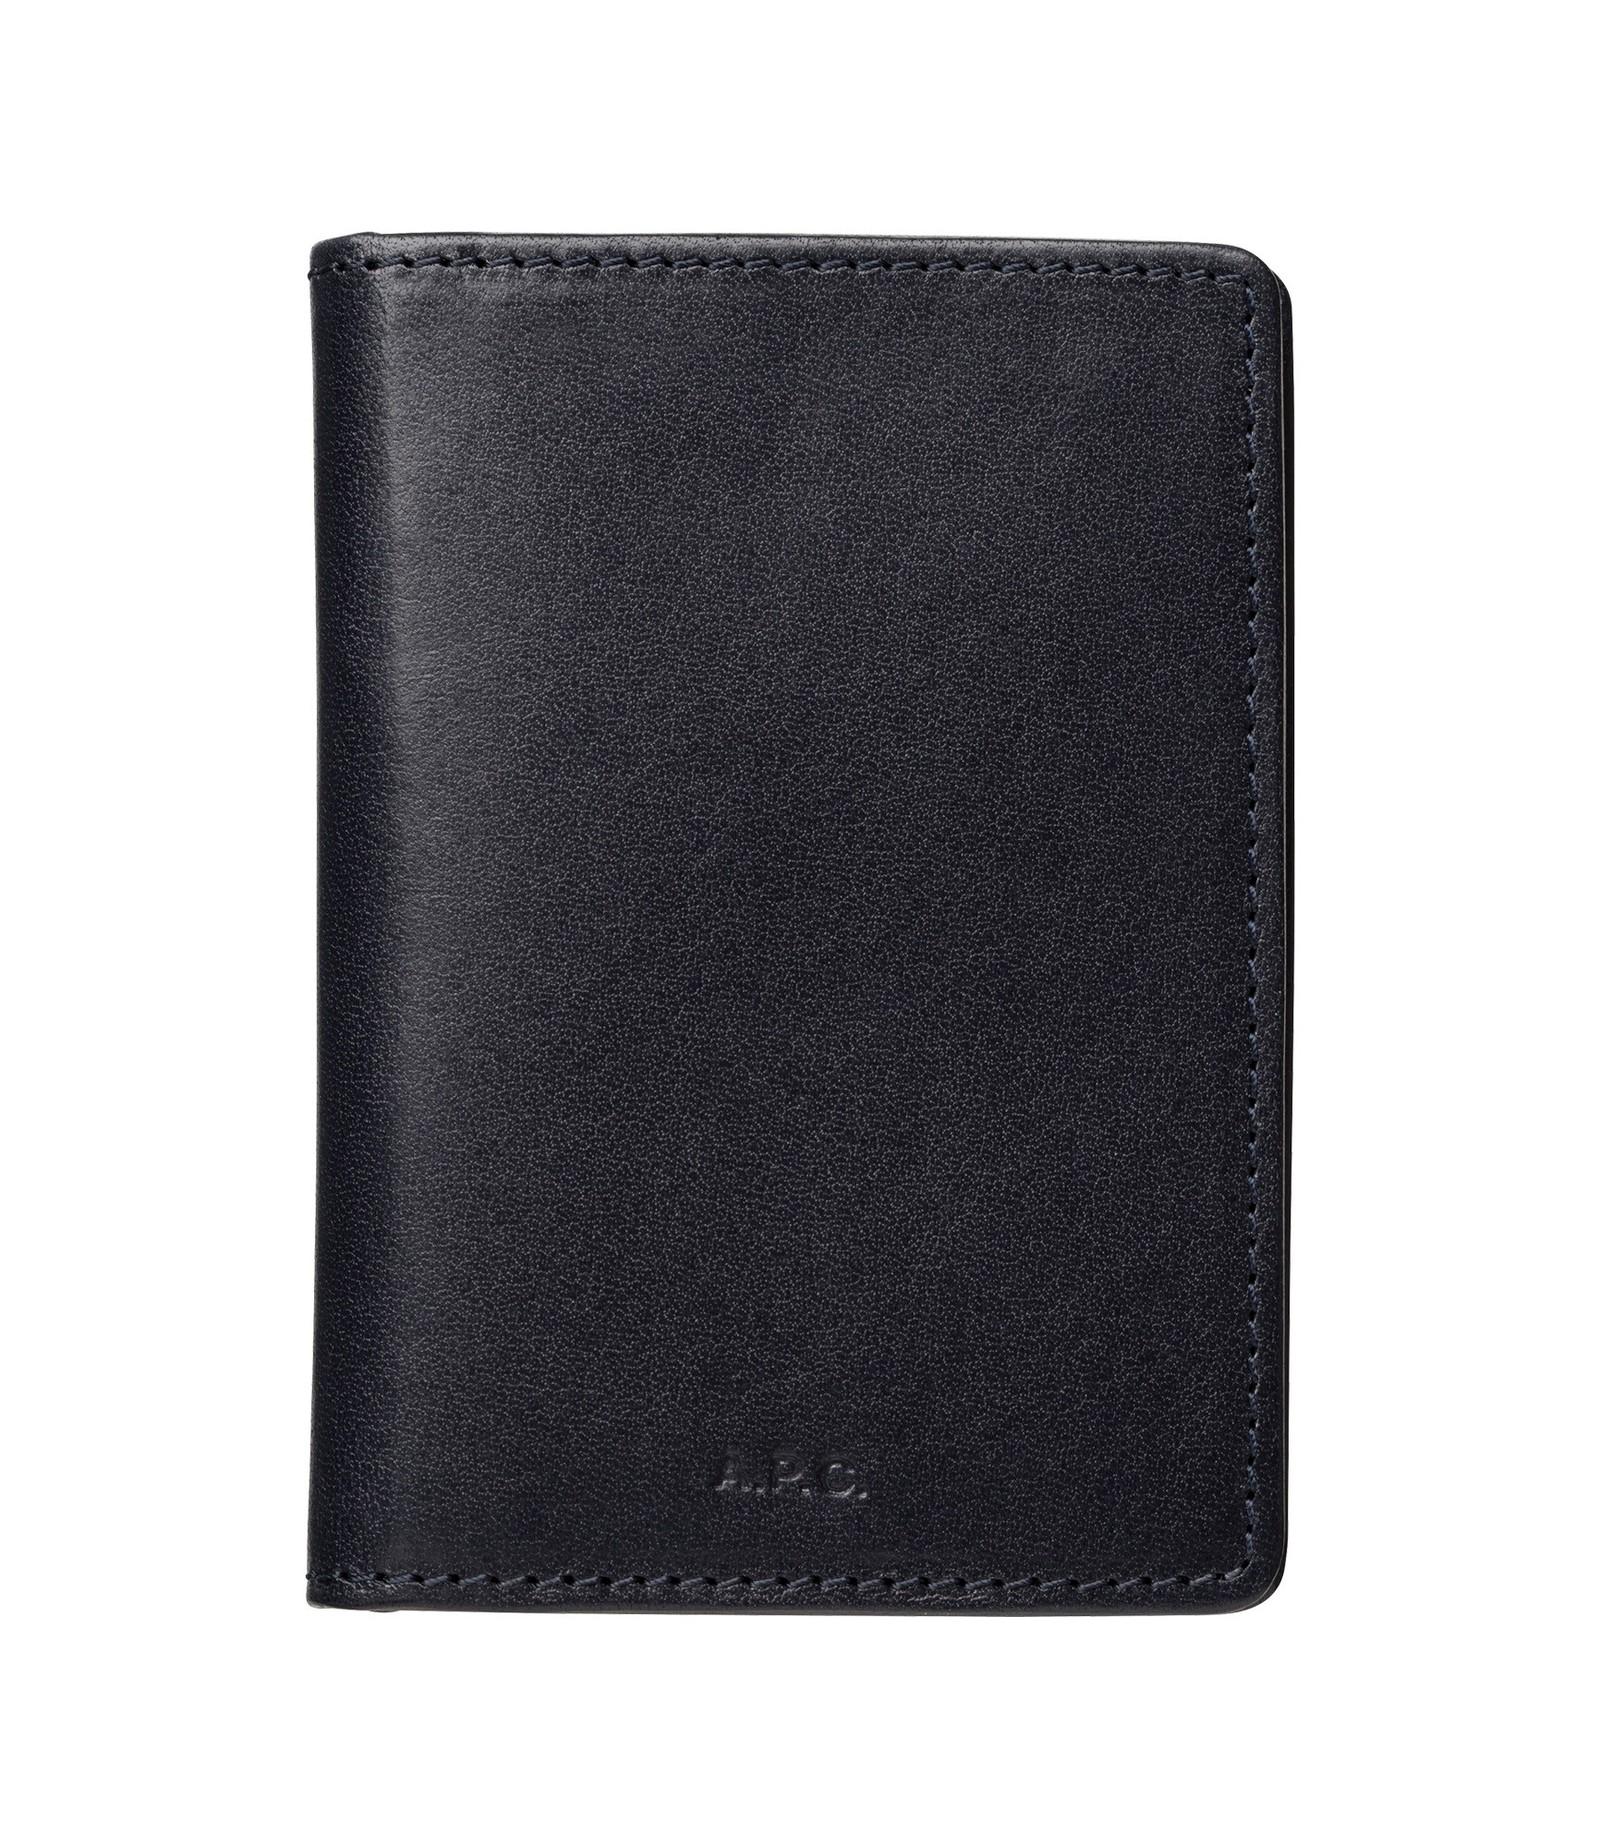 APC Andrew cardholder wallet